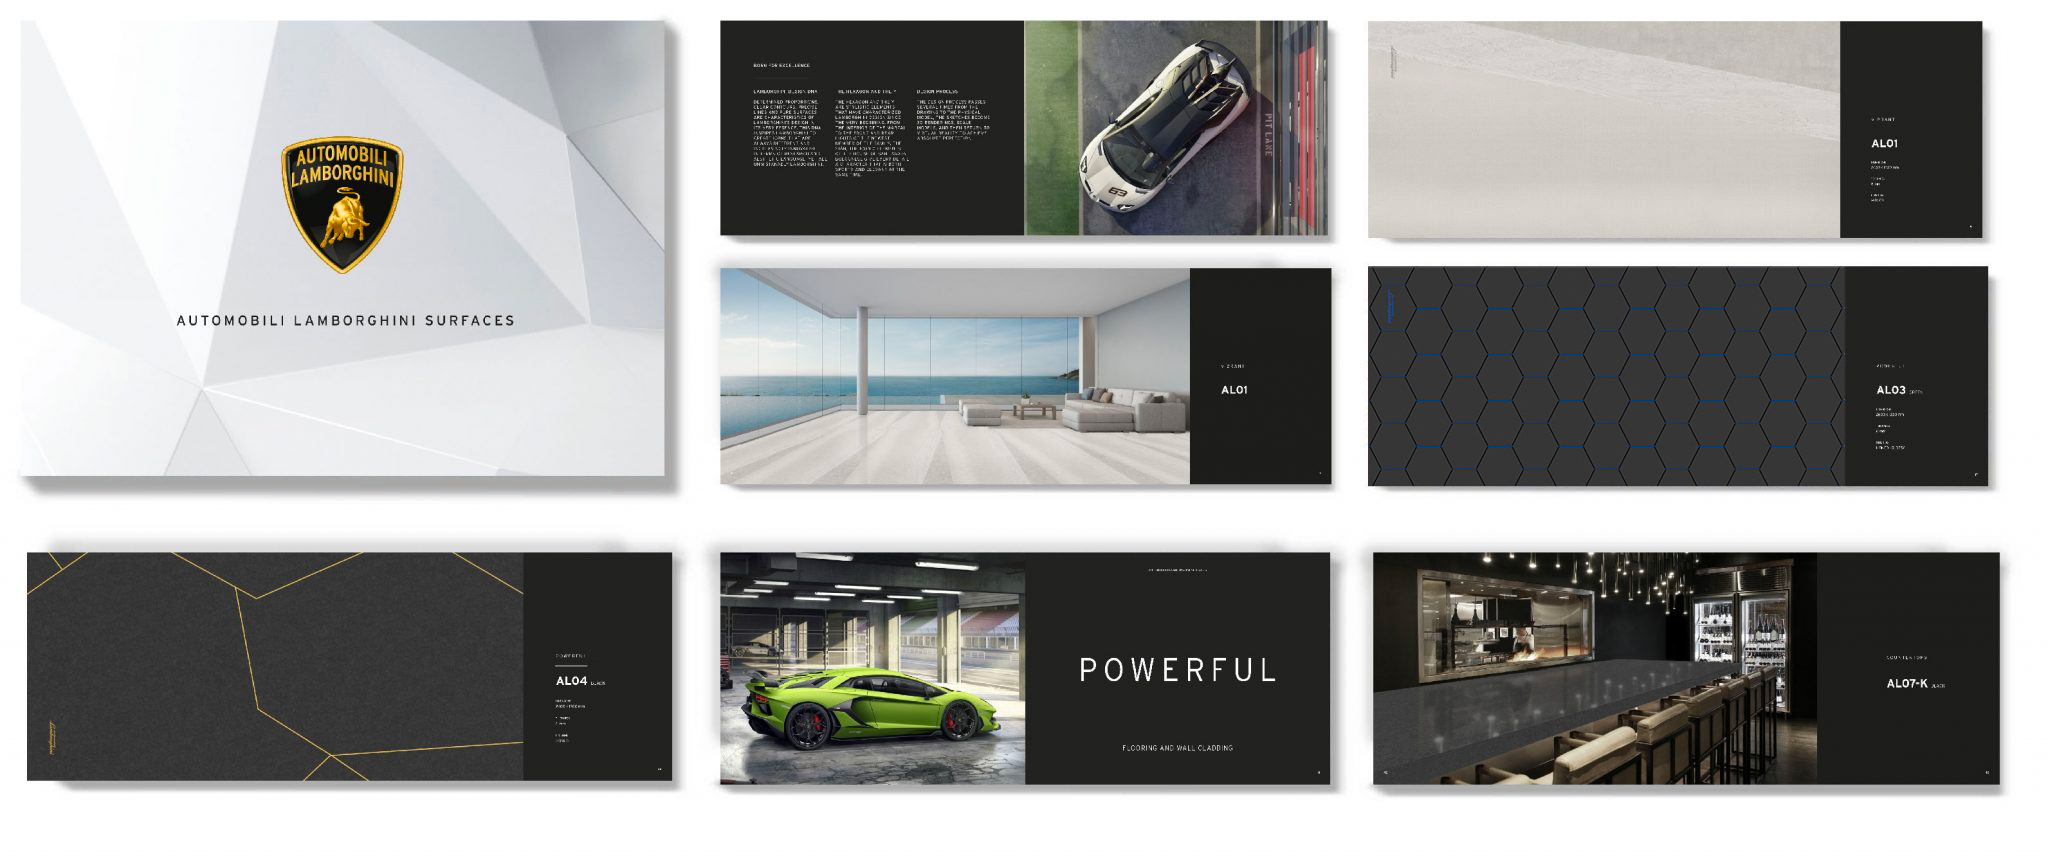 Automobili Lamborghini Catalog